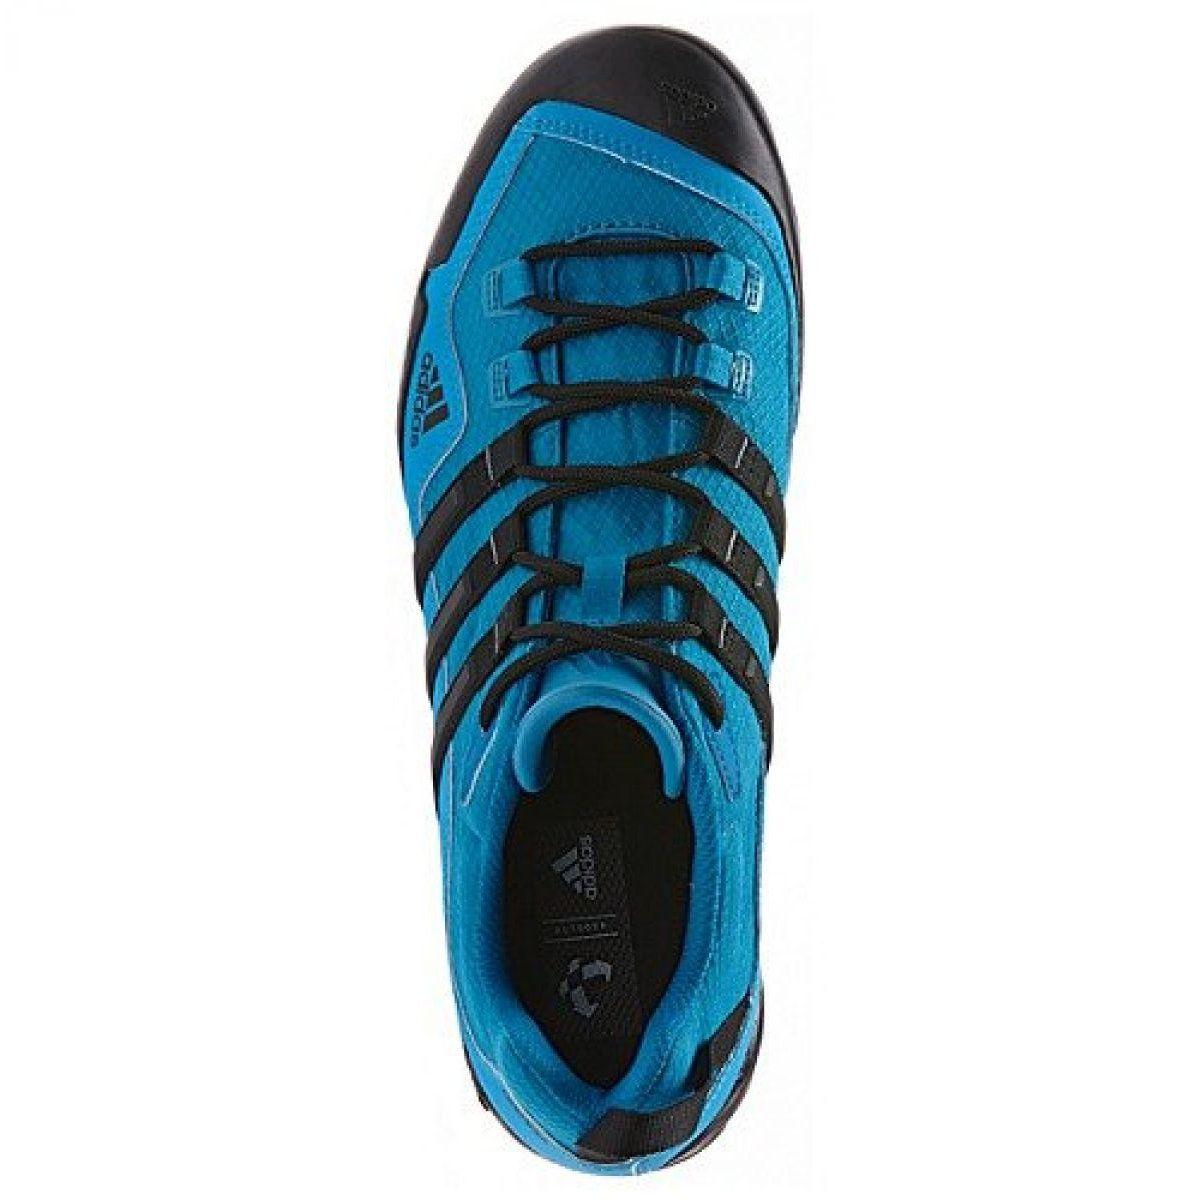 Sportowe Meskie Adidas Niebieskie Buty Adidas Terrex Swift Solo M D67033 Black Shoes Shoes Sports Shoes Adidas